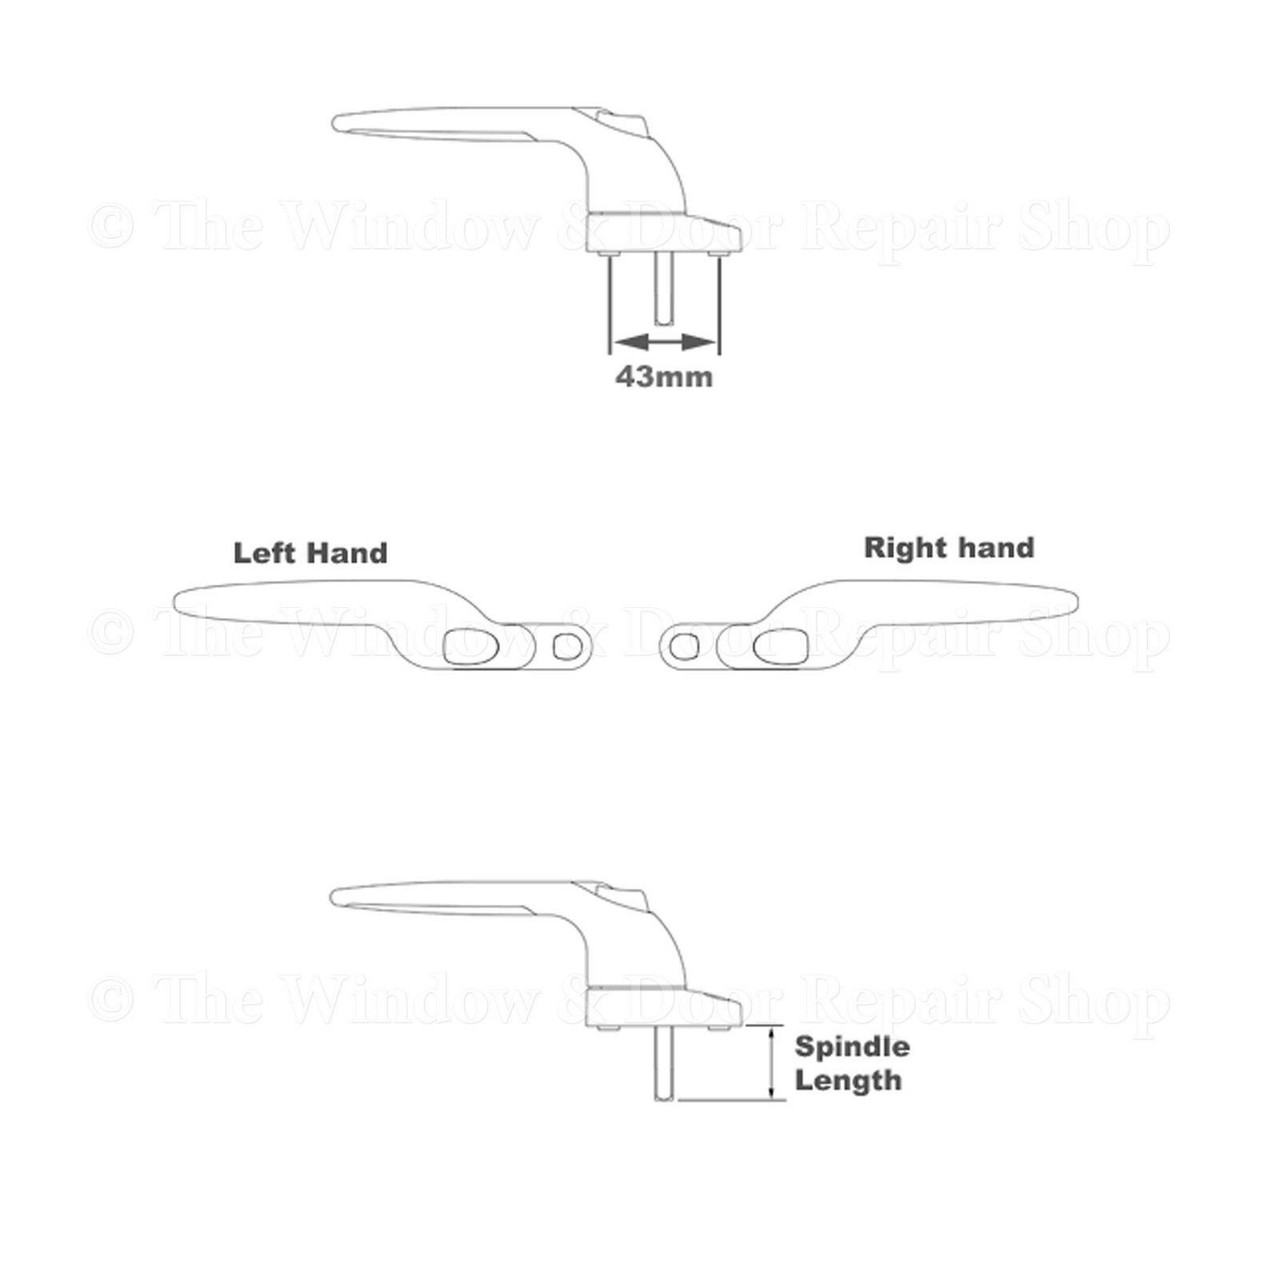 Key Lock Left or Right 1 x Left 30mm White Sparta 2 Cranked UPVC Window Handle Espag Locking